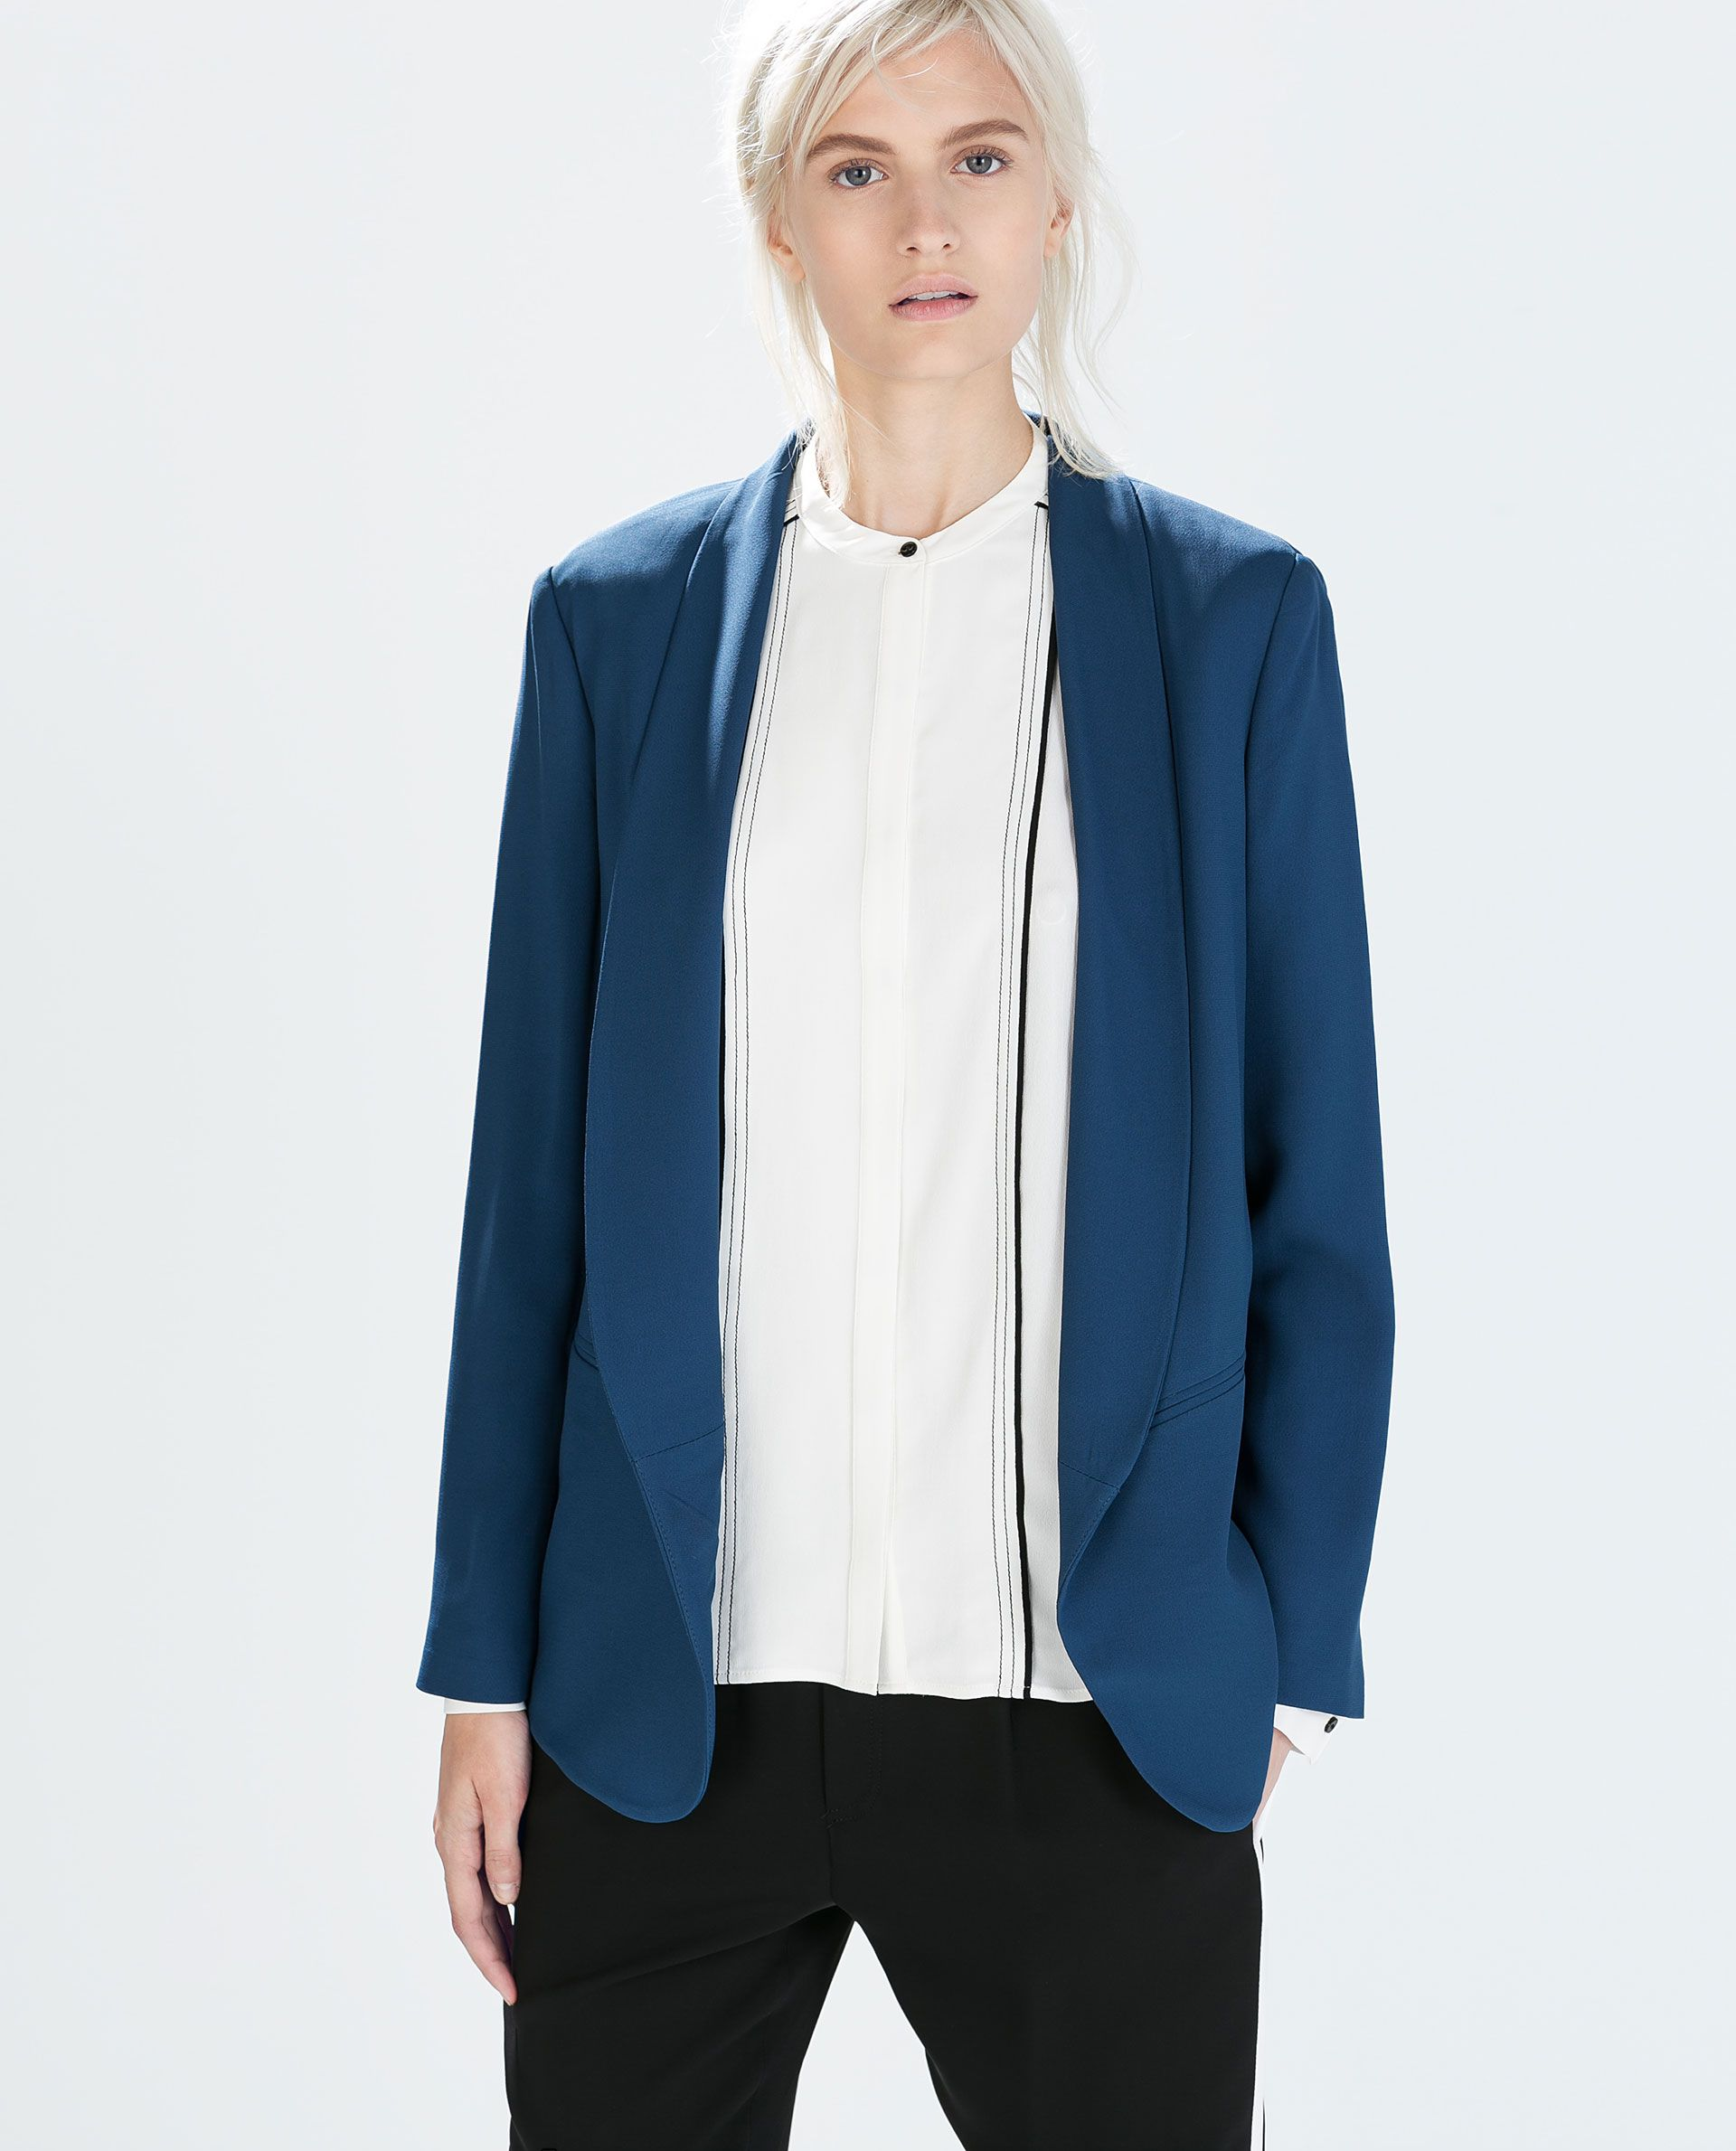 Image From With Tuxedo Of Zara Collar Soft Blazer 2 qUMSpLGzV